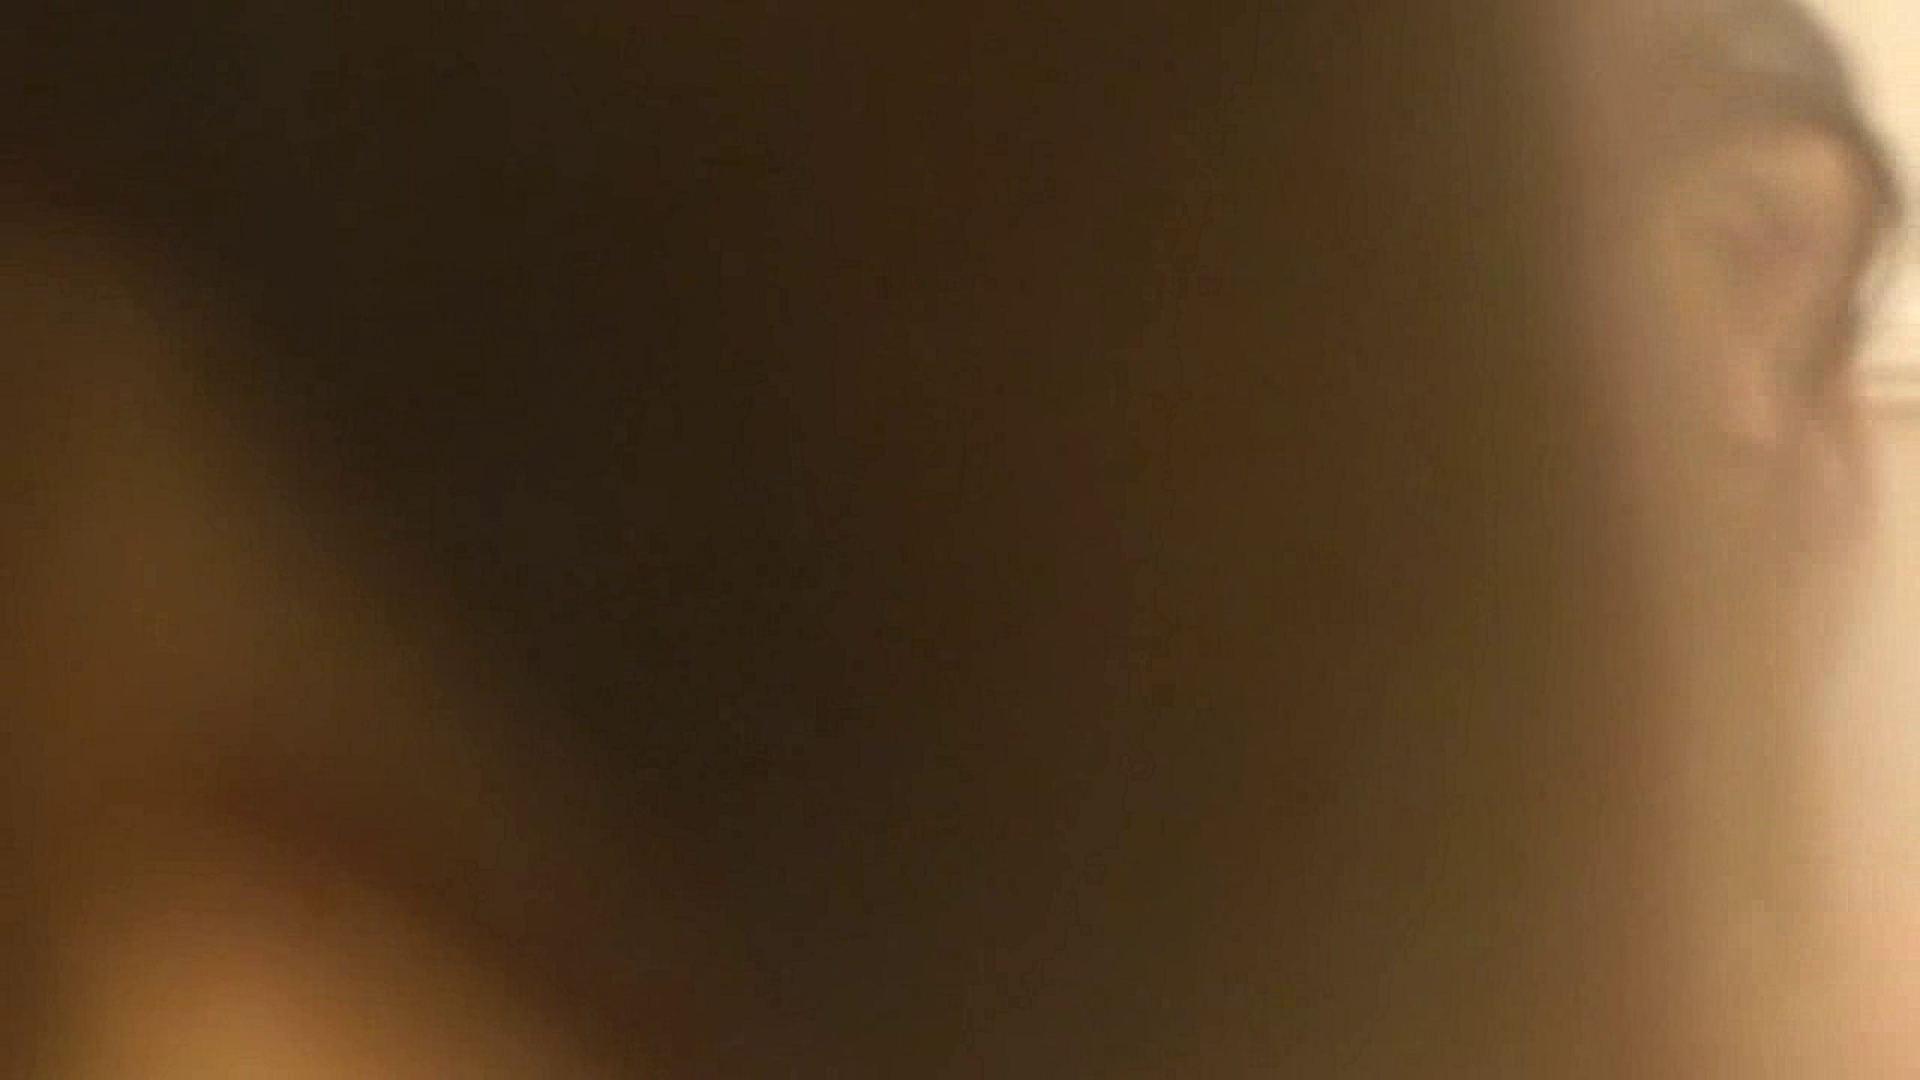 vol.1 Mayumi 窓越しに入浴シーン撮影に成功 OLの実態 | 入浴中のオンナ  17pic 7